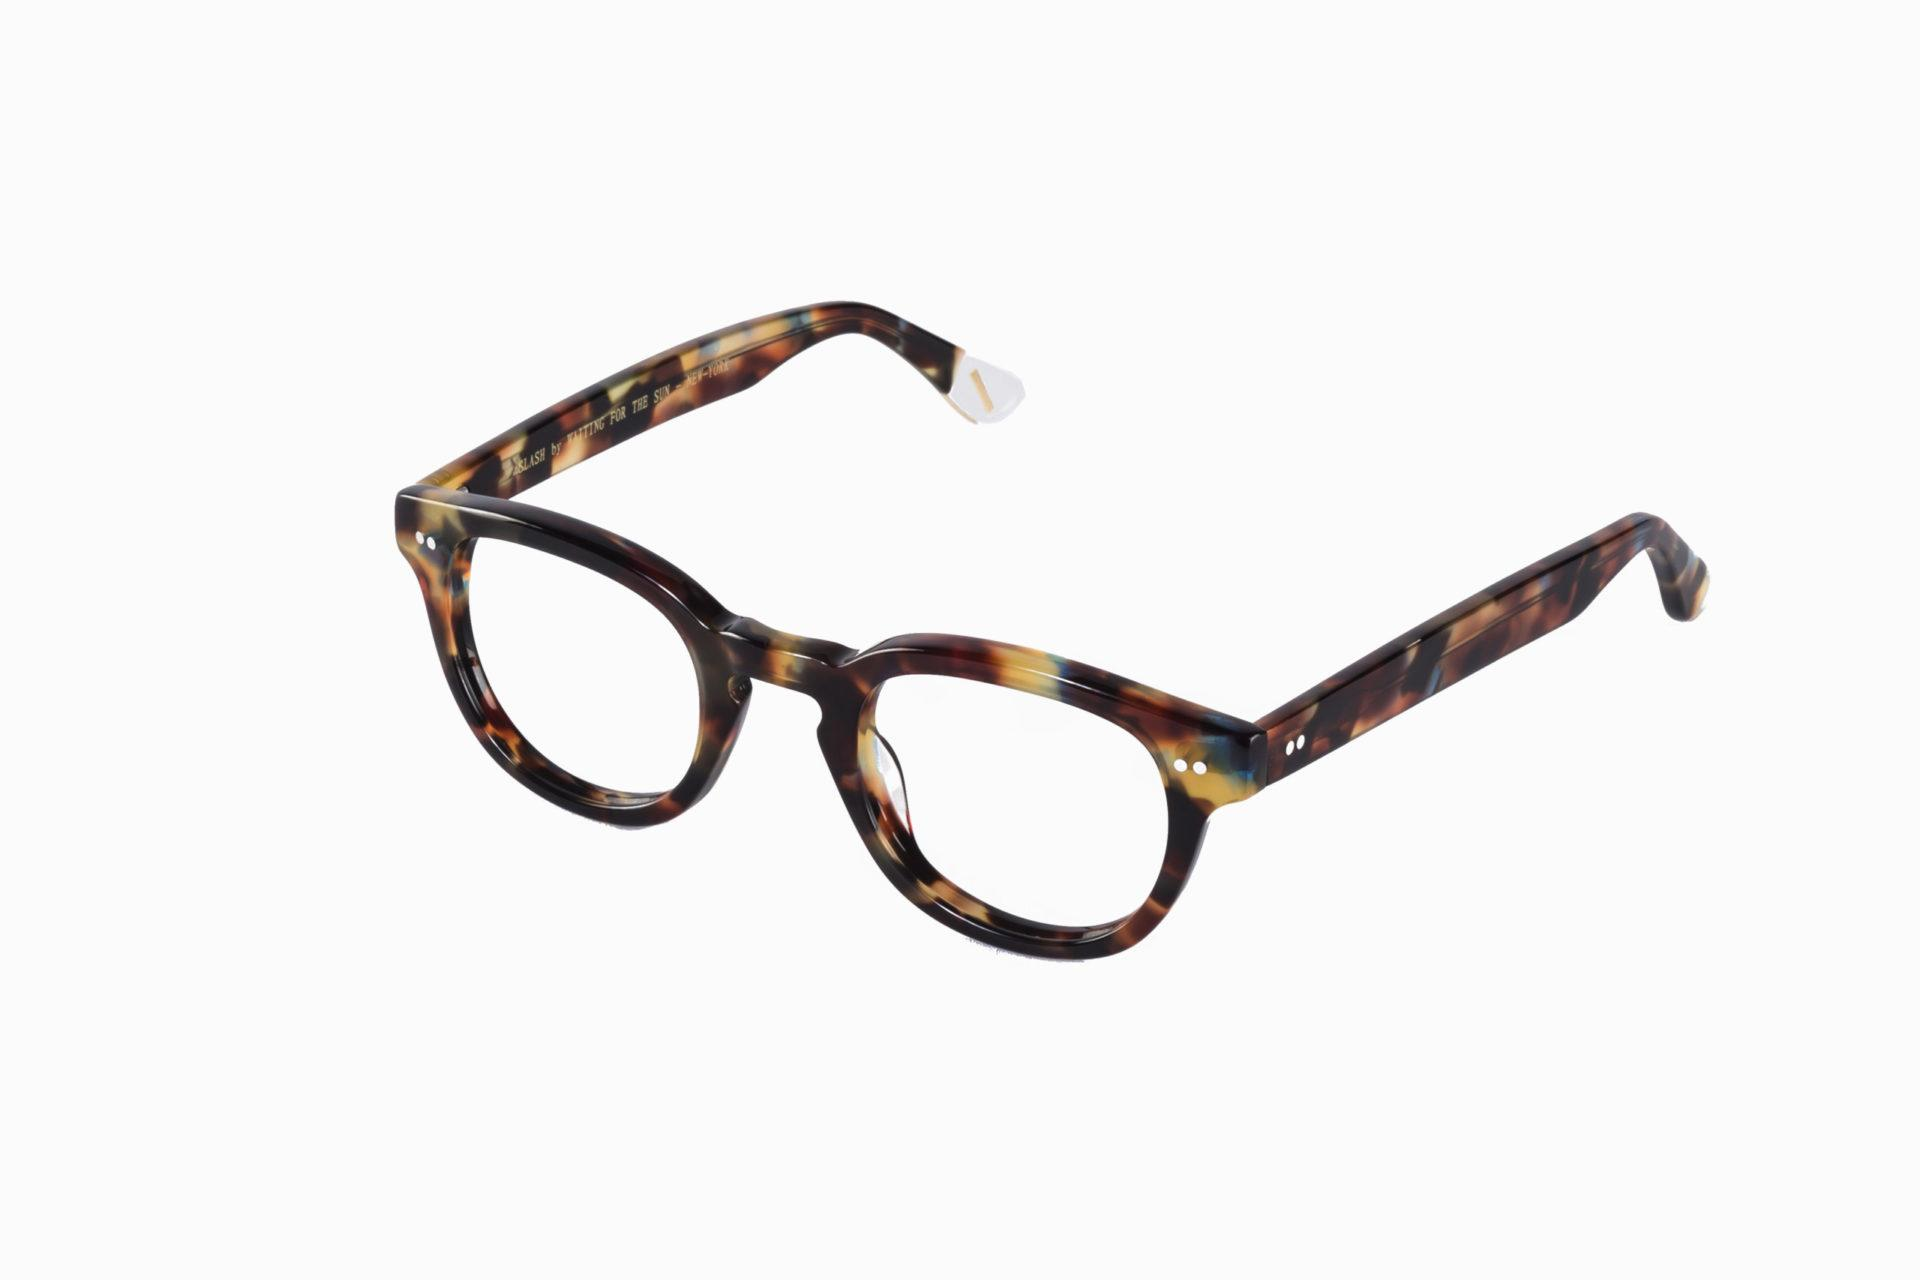 lunette profil nyc7rx-1-1